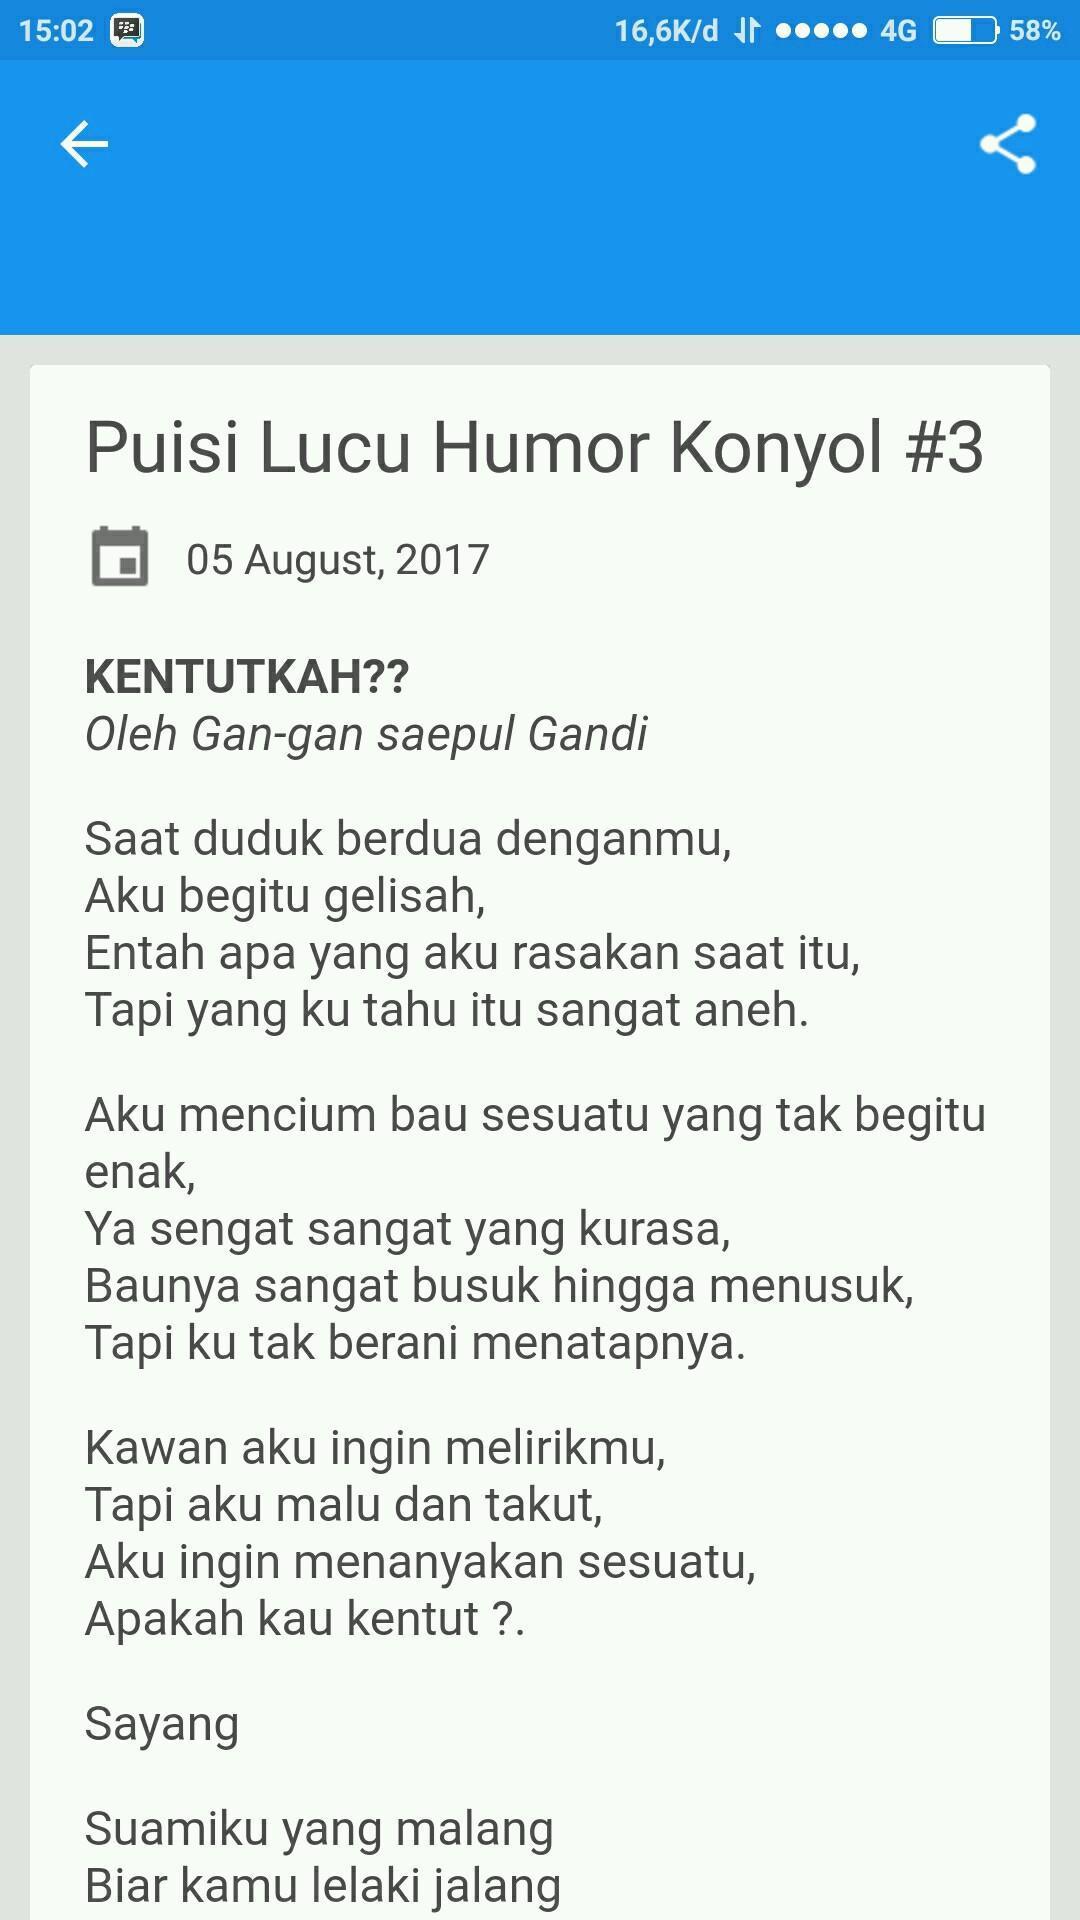 Puisi Lucu Humor Konyol For Android APK Download